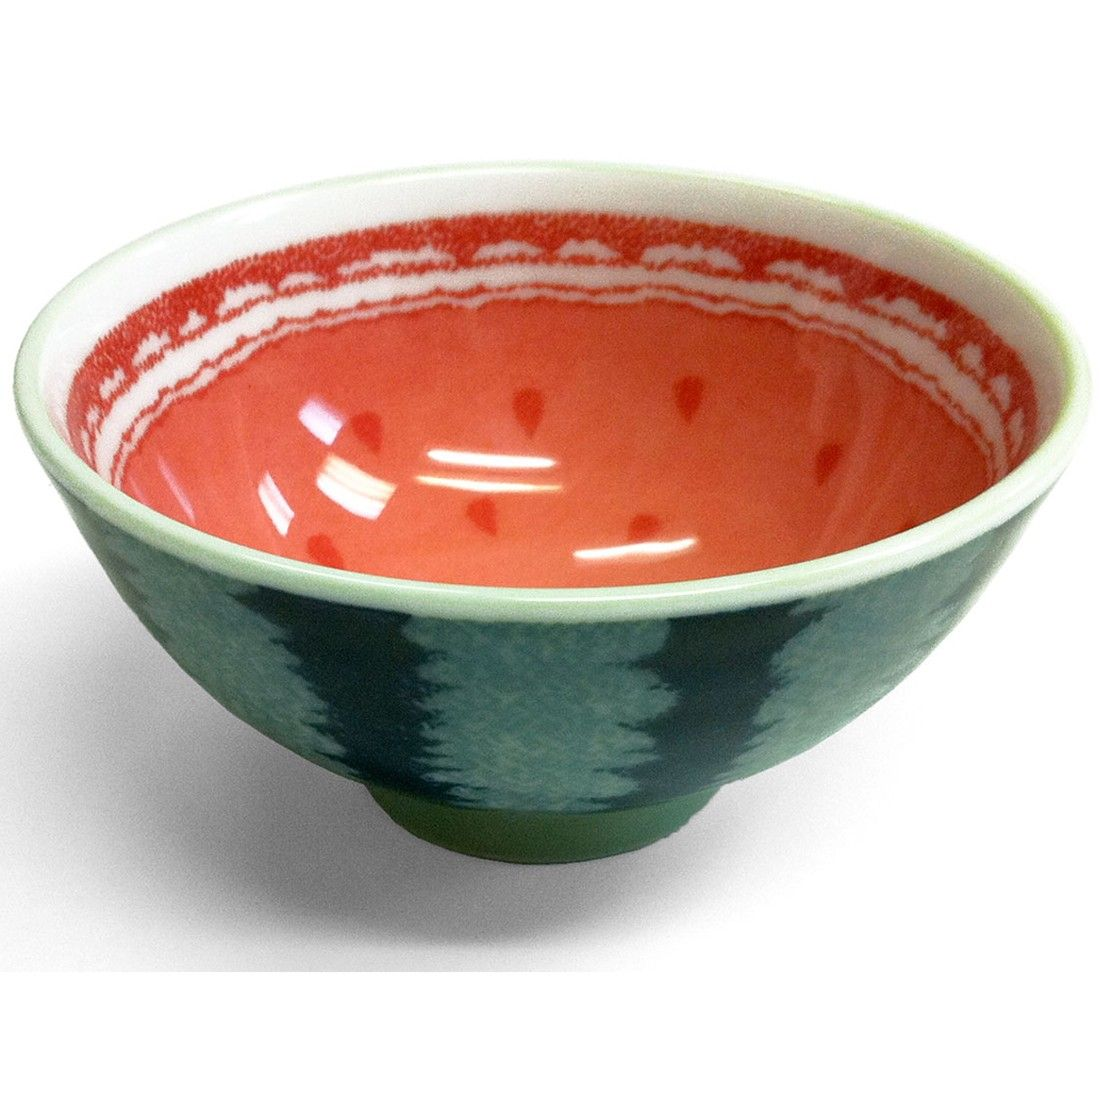 Miya Company Watermelon Rice Bowl [$7.95]